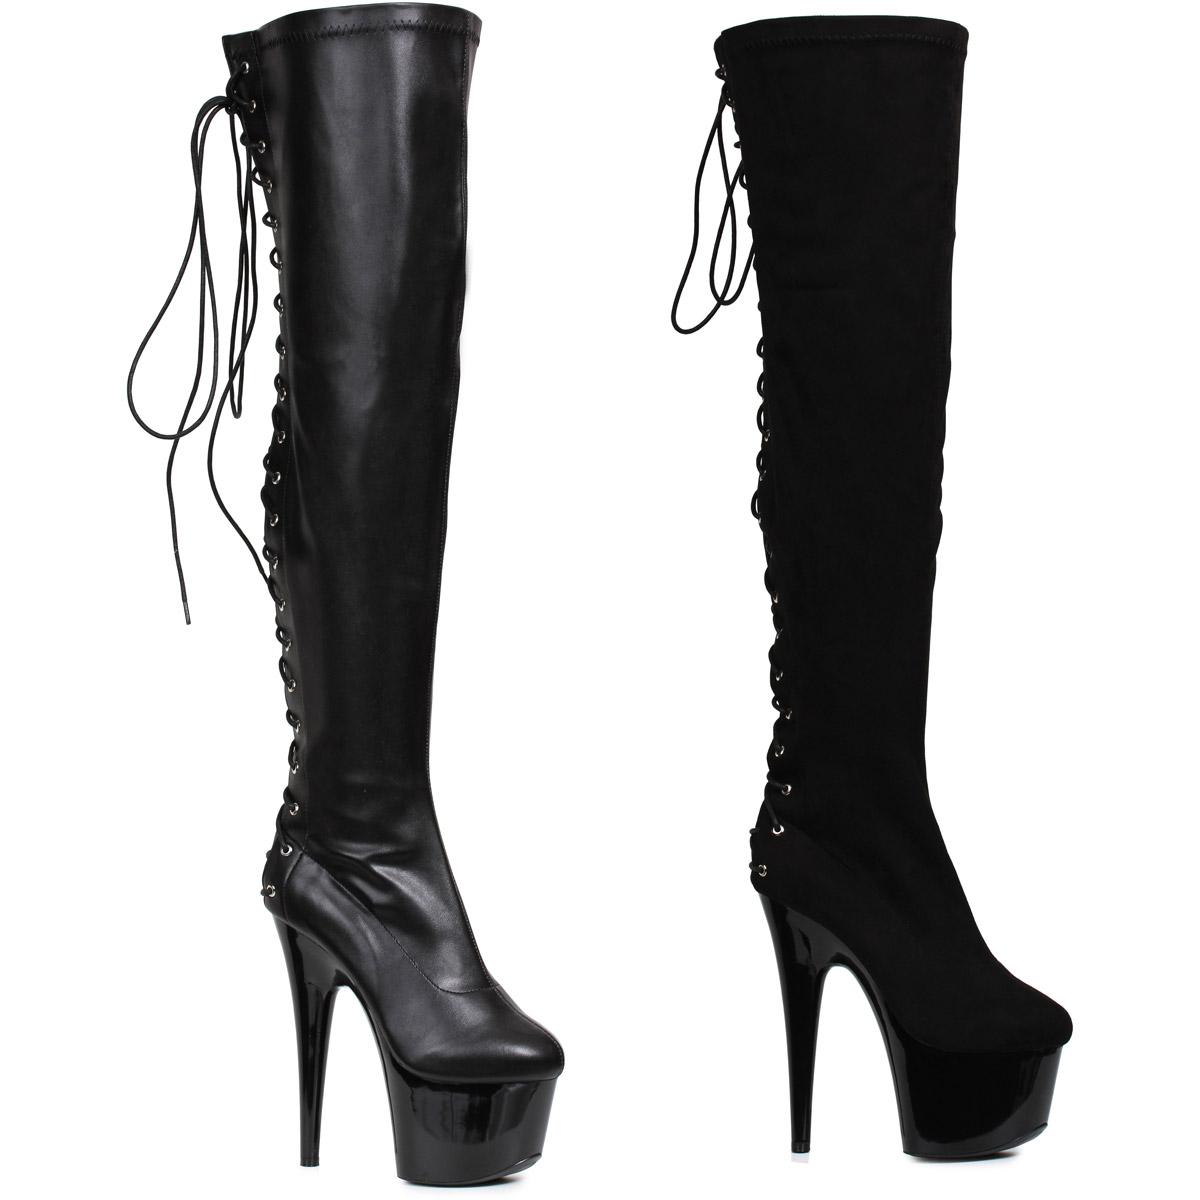 Sexy-Hot-Black-Velvet-Ellie-6-034-Thigh-High-Knee-Boots-Halloween-Shoes-Adult-Women thumbnail 2